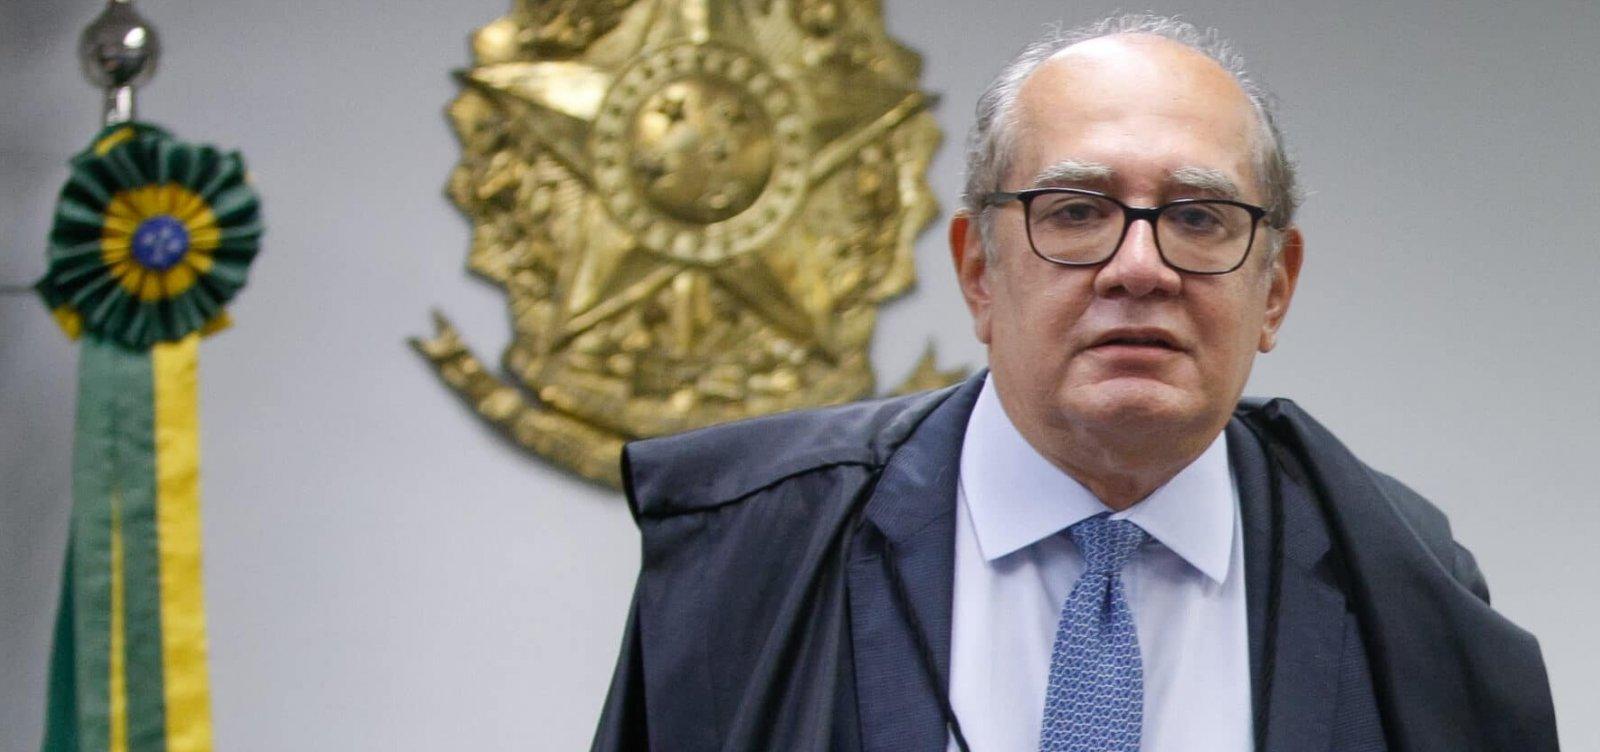 [Mendes desmente Ernesto Araújo sobre responsabilidade pelo enfrentamento à pandemia no Brasil]